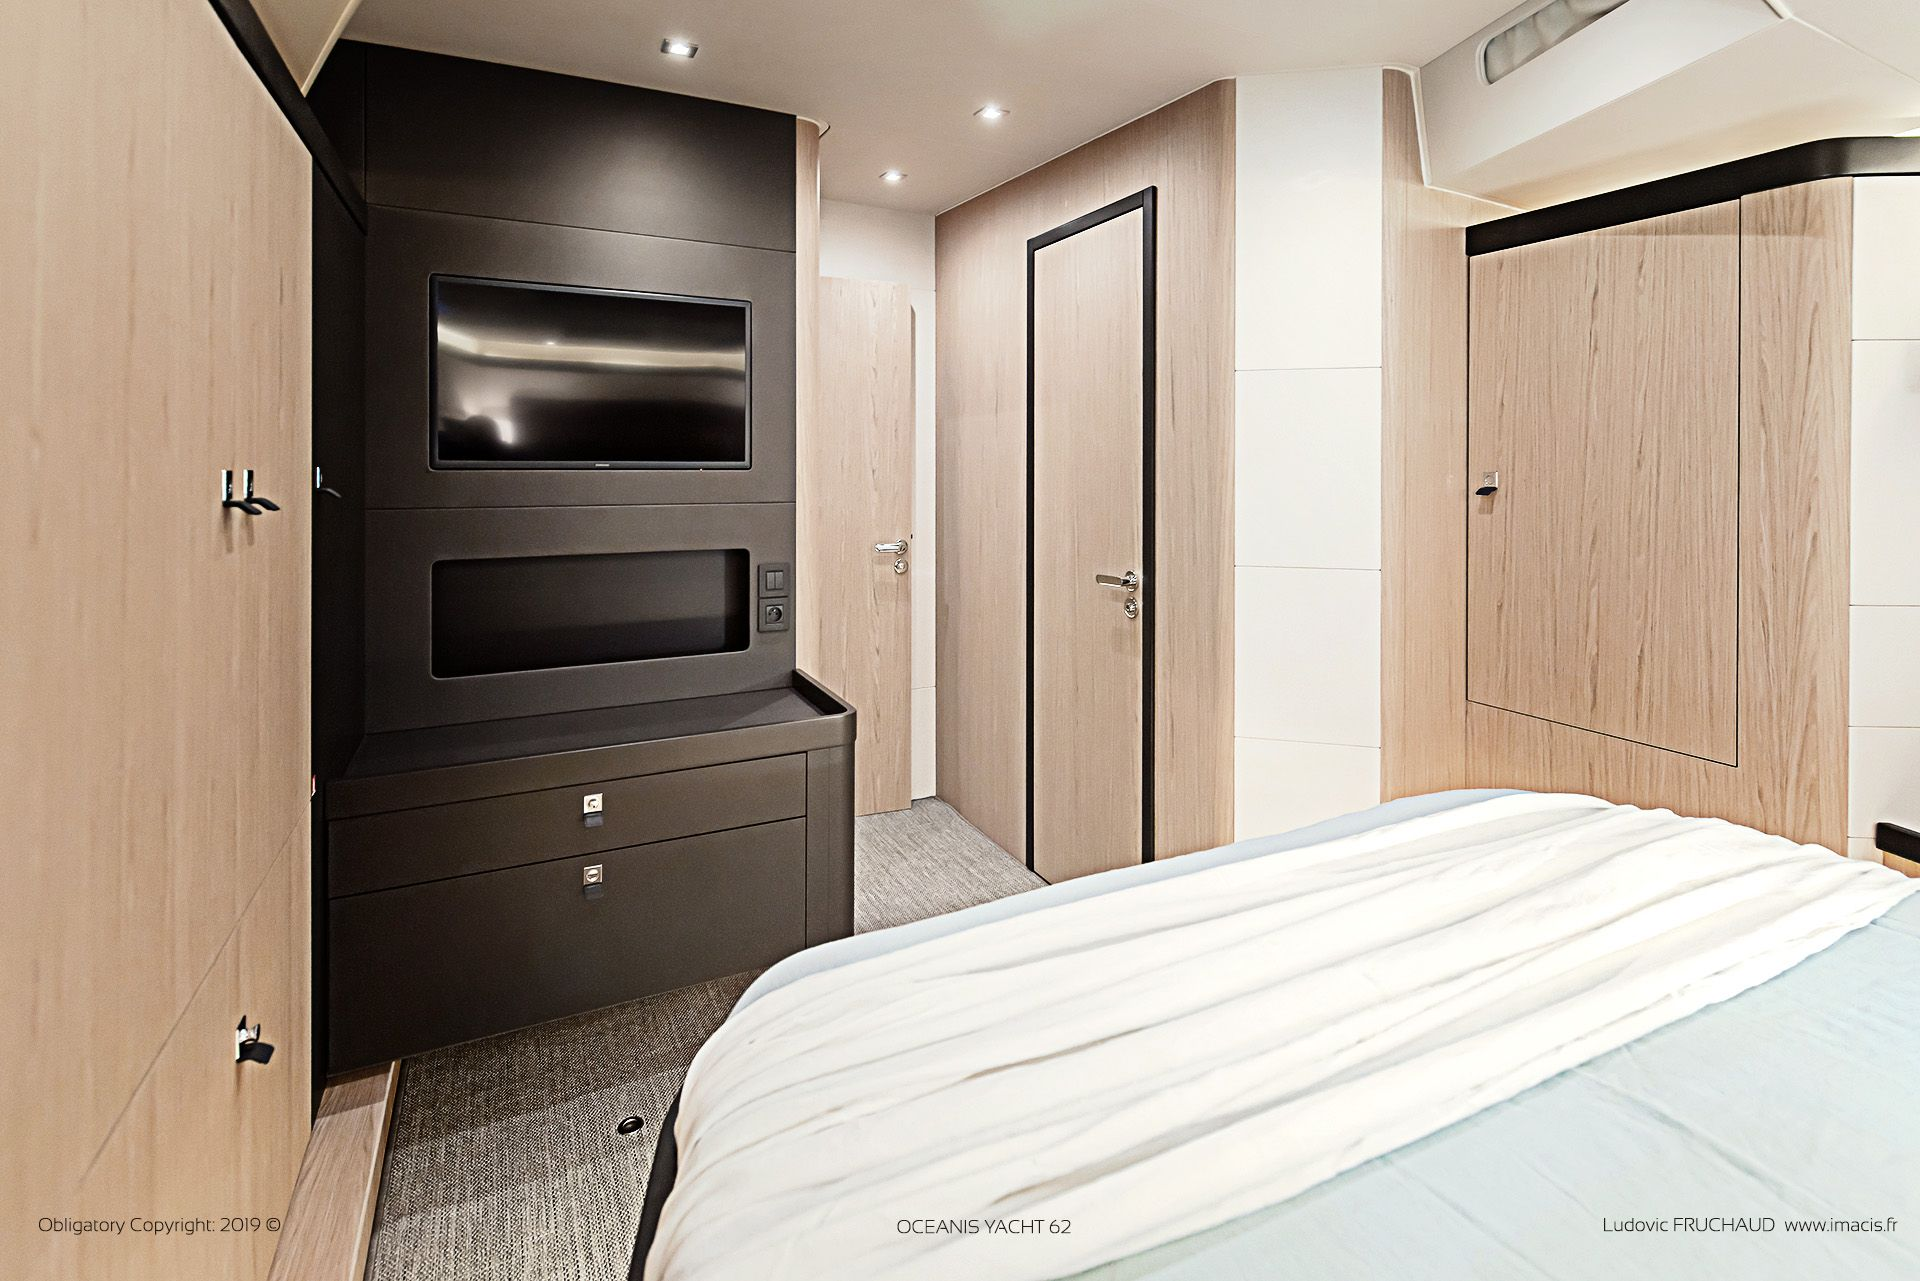 Oceanis Yacht 62 By Imacis Master Cabin Design Nauta Photography Ludovic Fruchaud Imacis Copyright 2019 Beneteau Oceanis Oceanisyacht Oceanis62 Yac